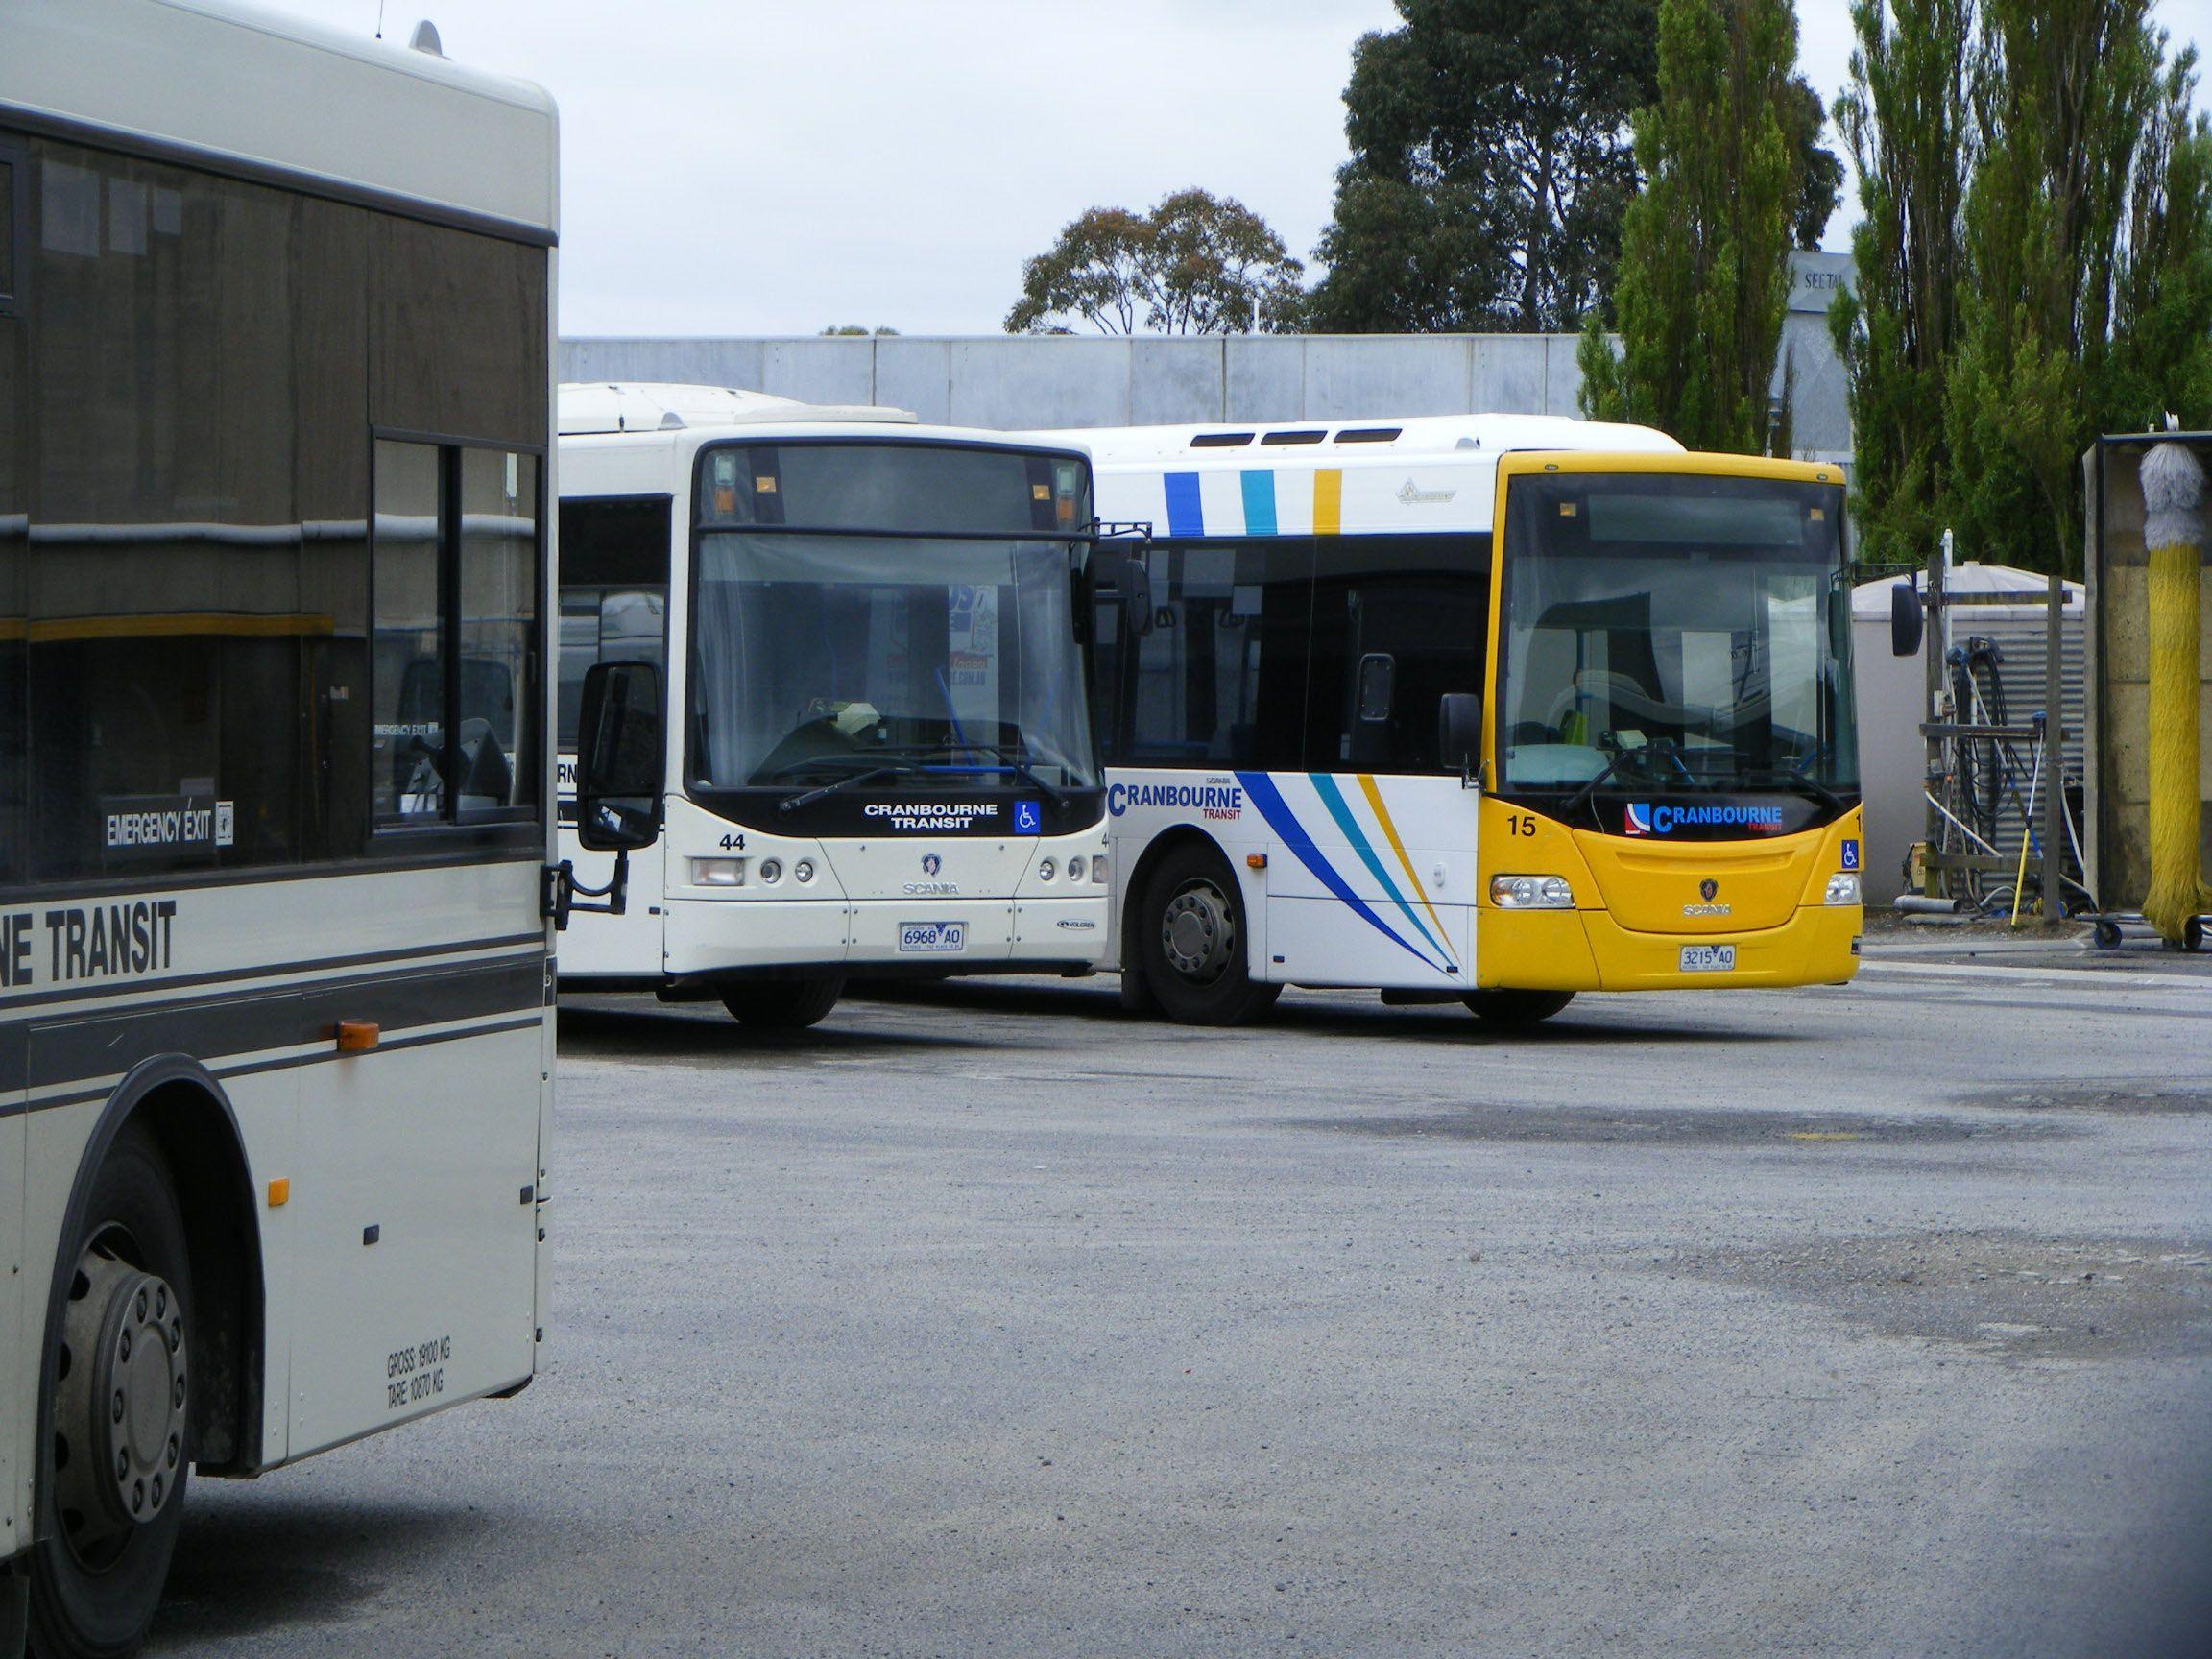 Pin by STANLEY COLUMBUS on TRANSIT BUS Bus, Driving